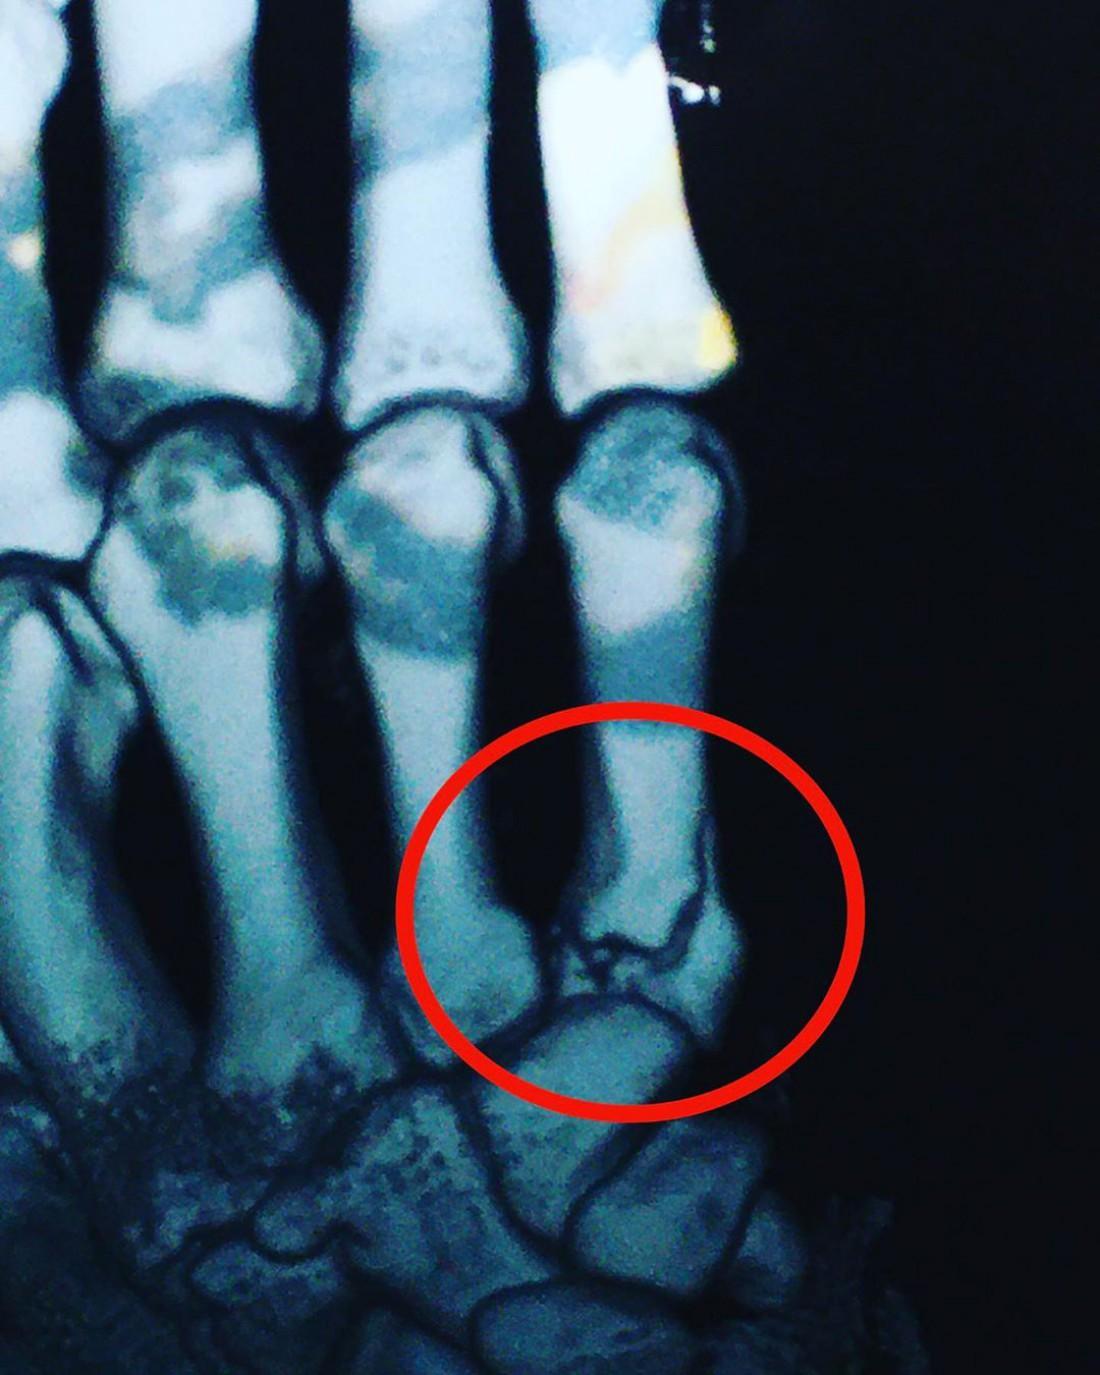 Рентгеновский снимок Артема Далакяна